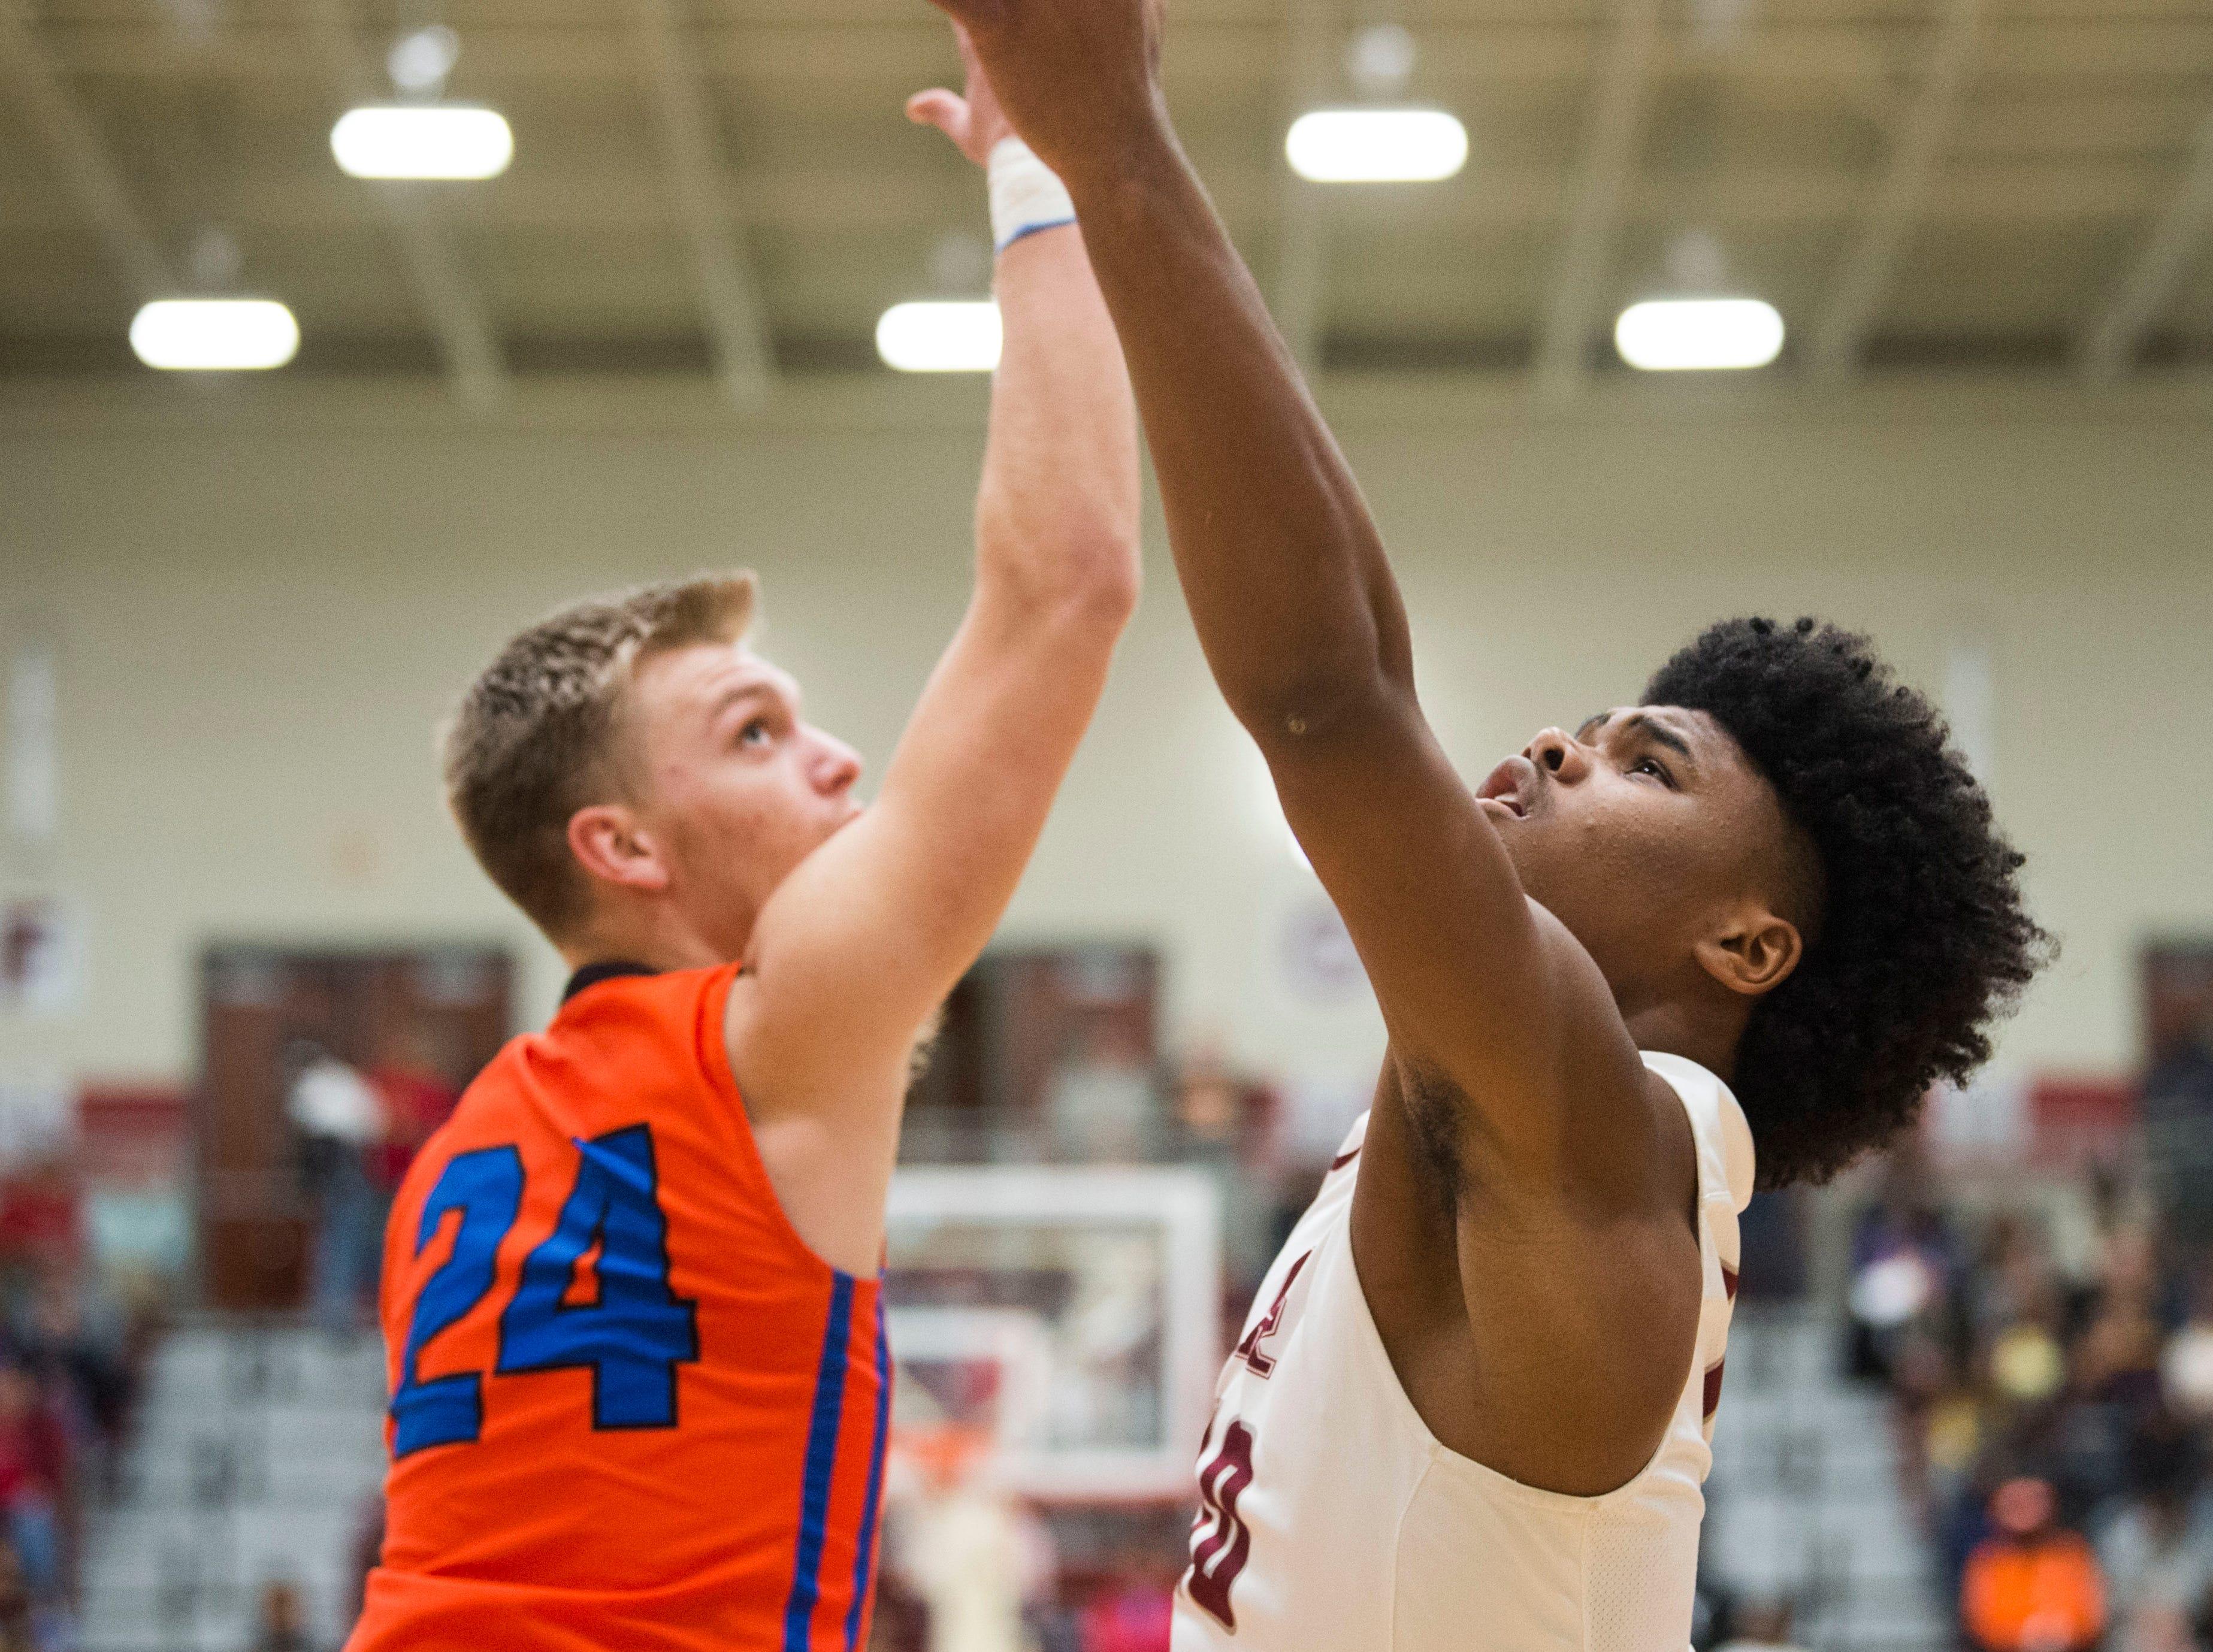 Oak Ridge's Herbert Booker takes a shot during a high school basketball game between Oak Ridge and Campbell County at Oak Ridge Friday, Feb. 1, 2019.